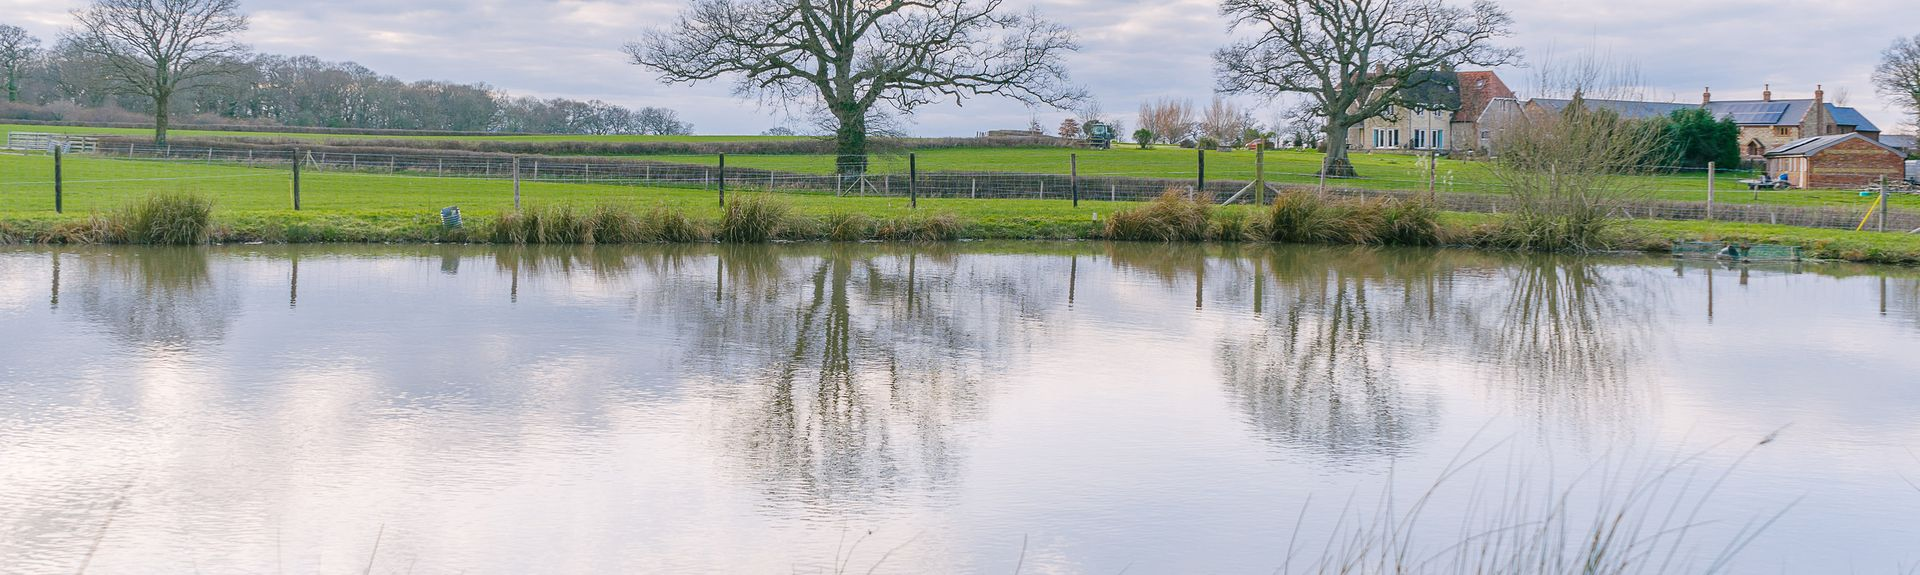 Winterborne Stickland, Dorset, UK